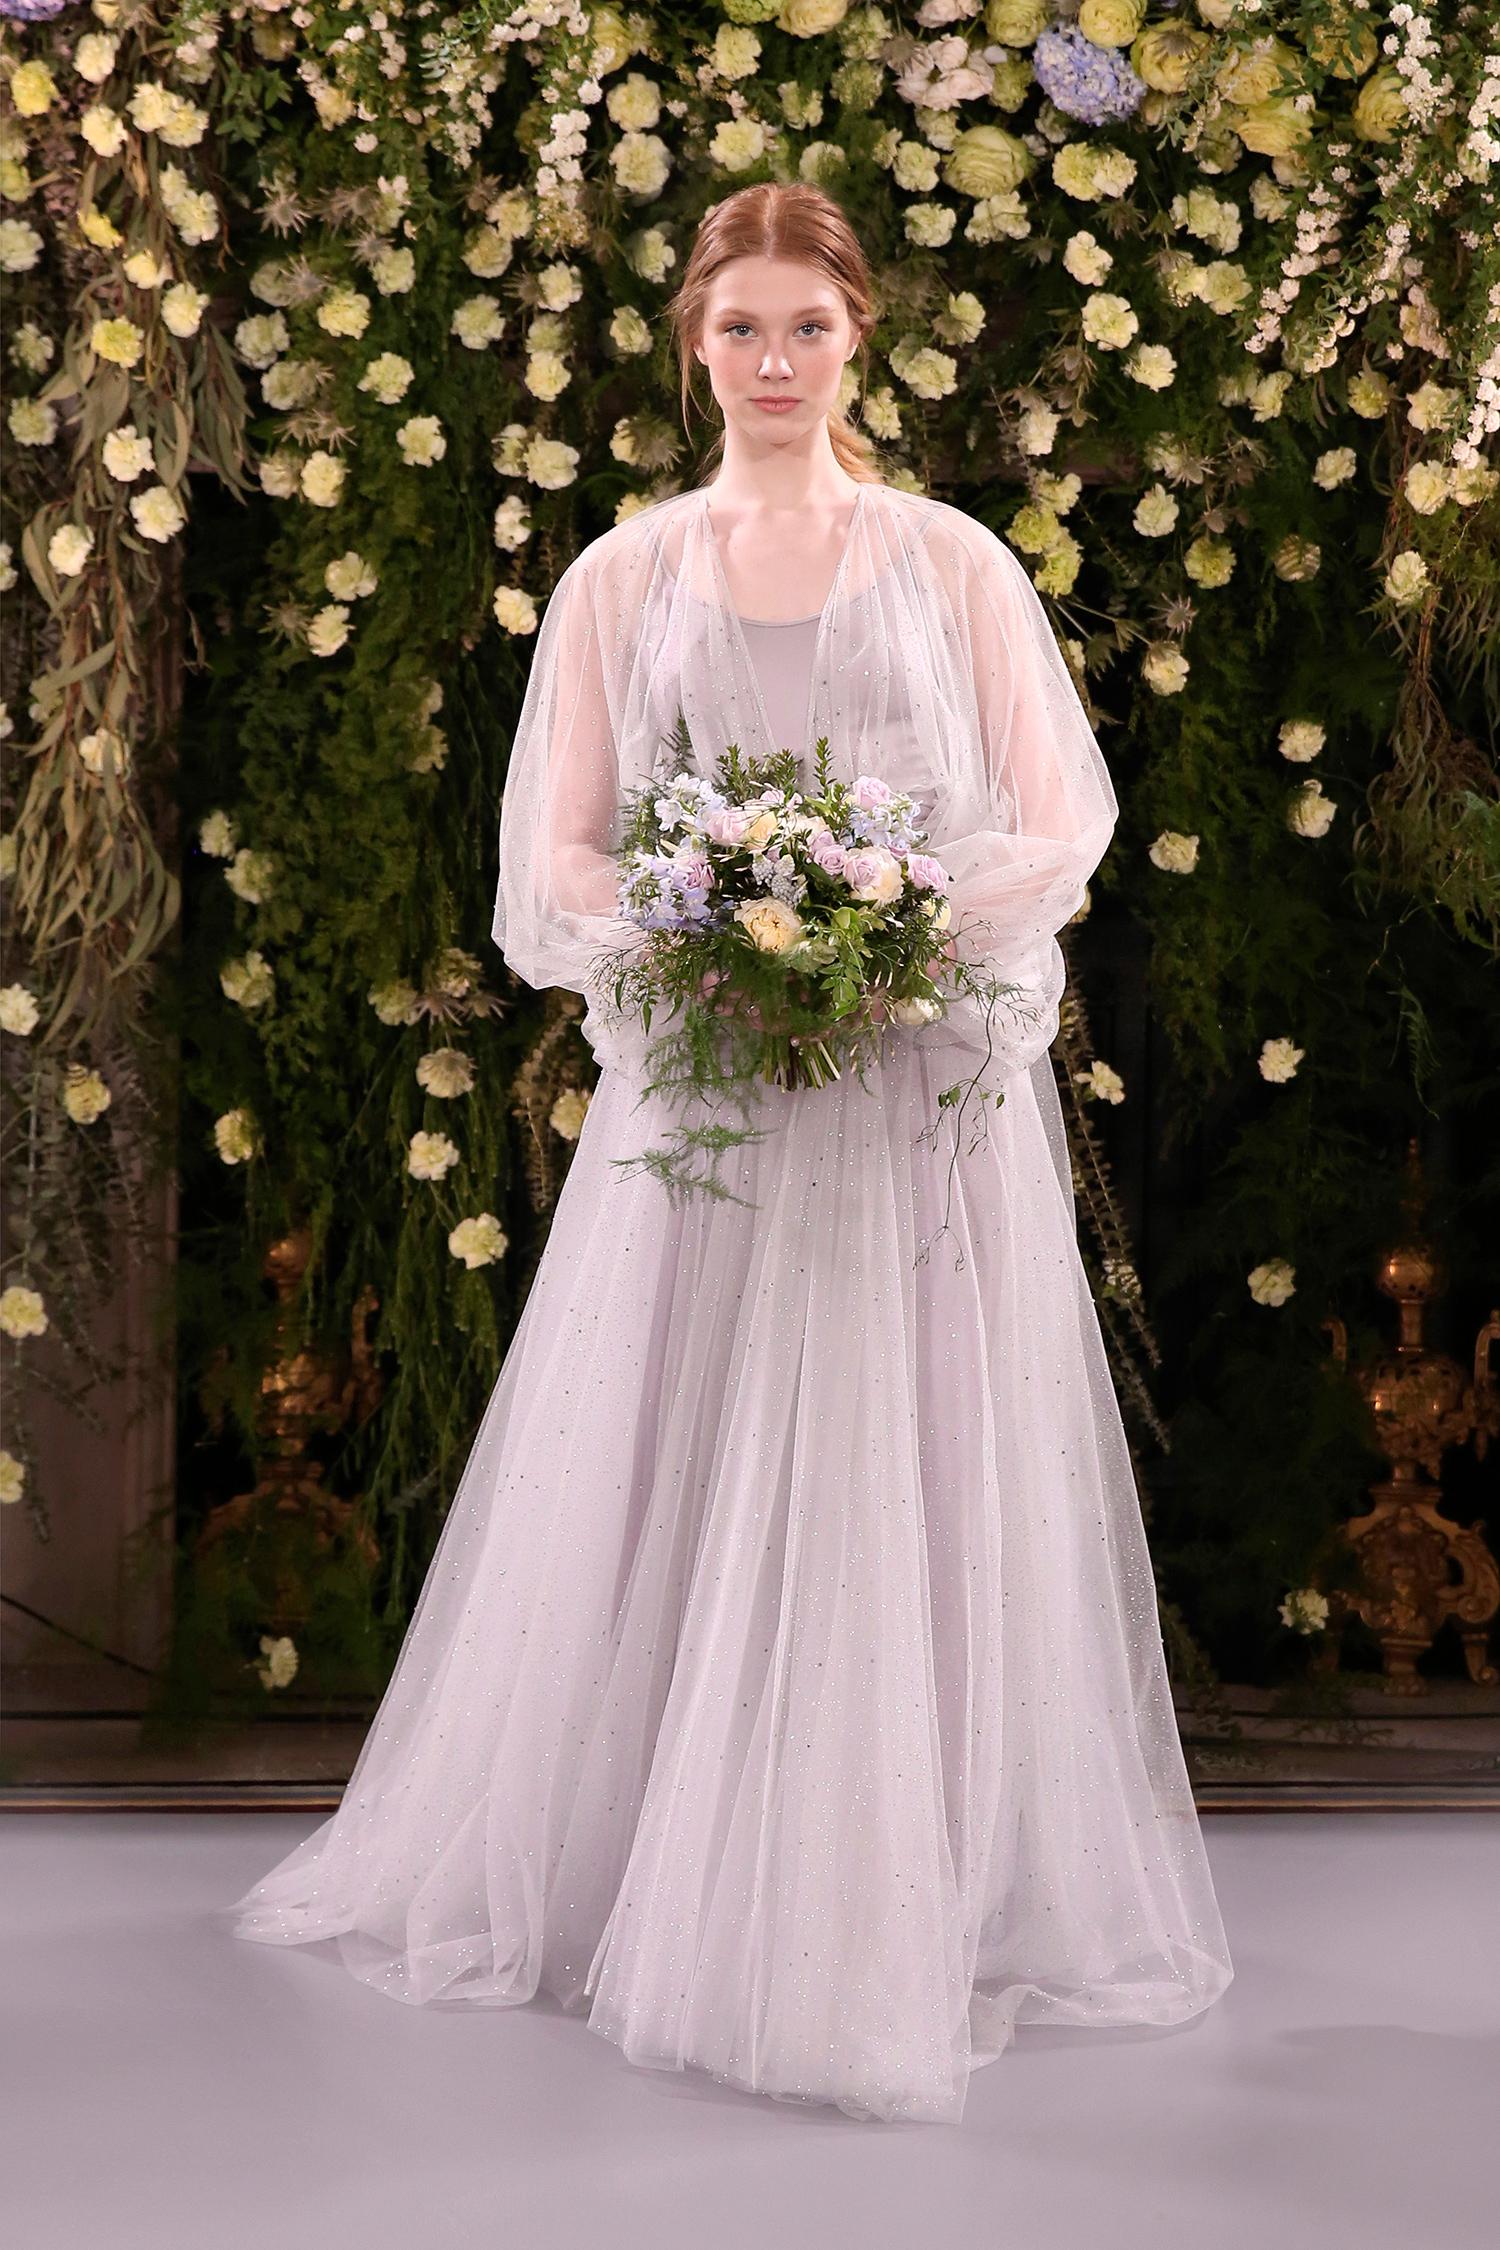 jenny packham wedding dress spring 2019 pale lavender with sheer overlay